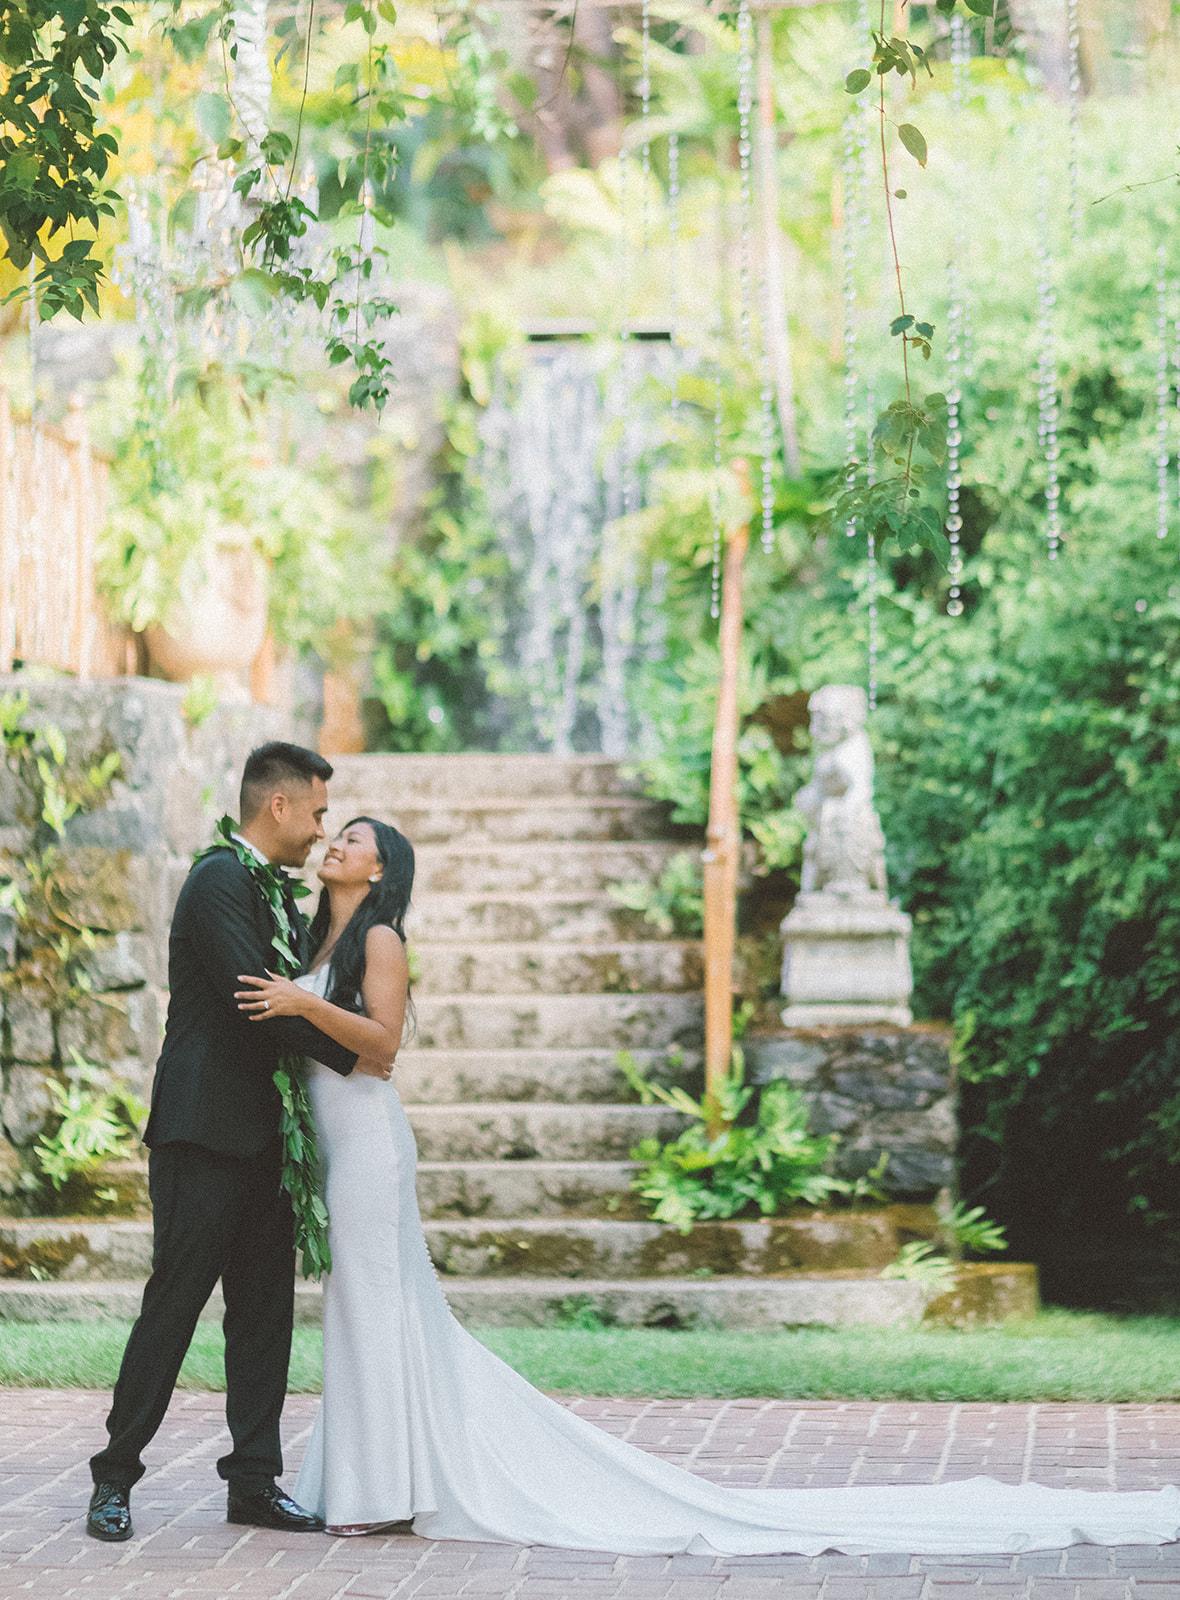 Haiku Mill Luxe Maui Wedding20190625_0223.jpg